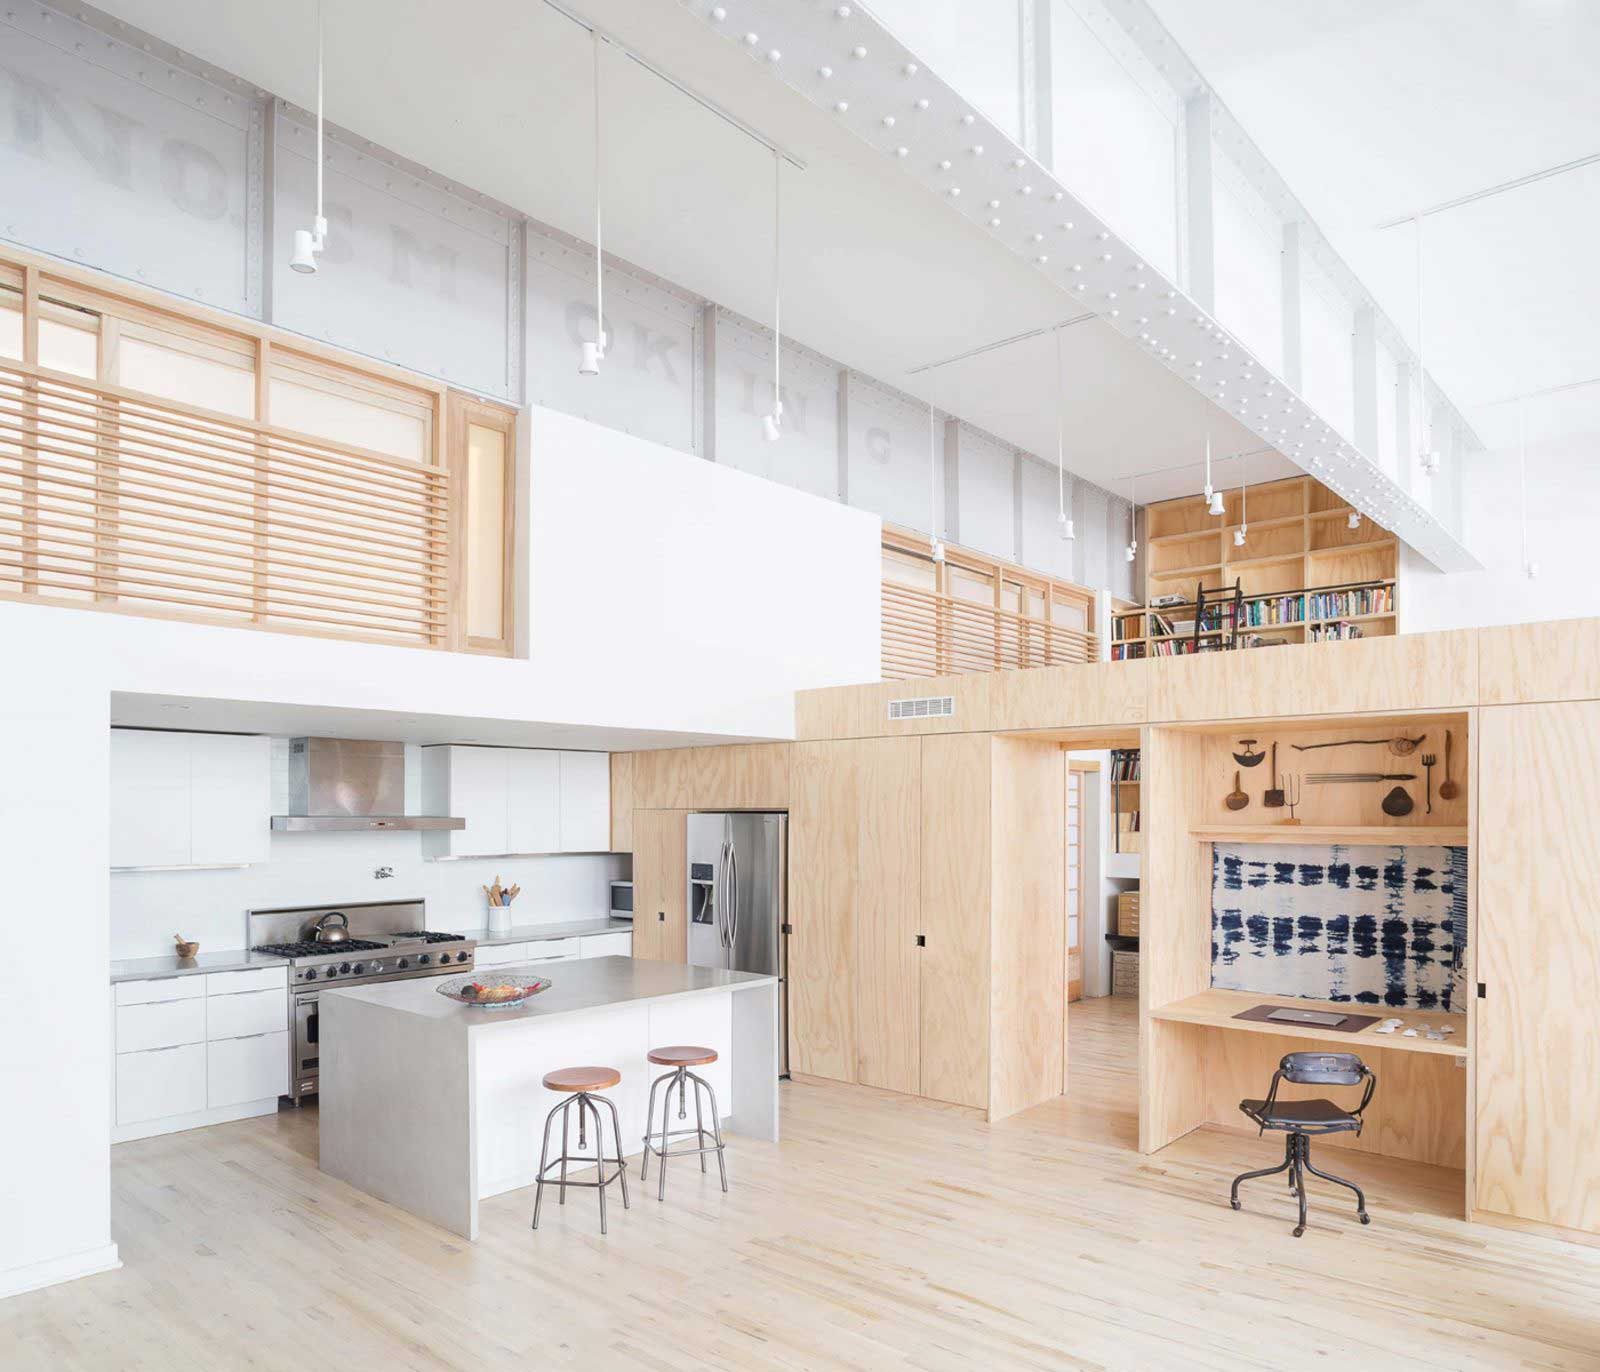 Wells fargo loft par jeff jordan architects - La residence kitchel par boora architects ...